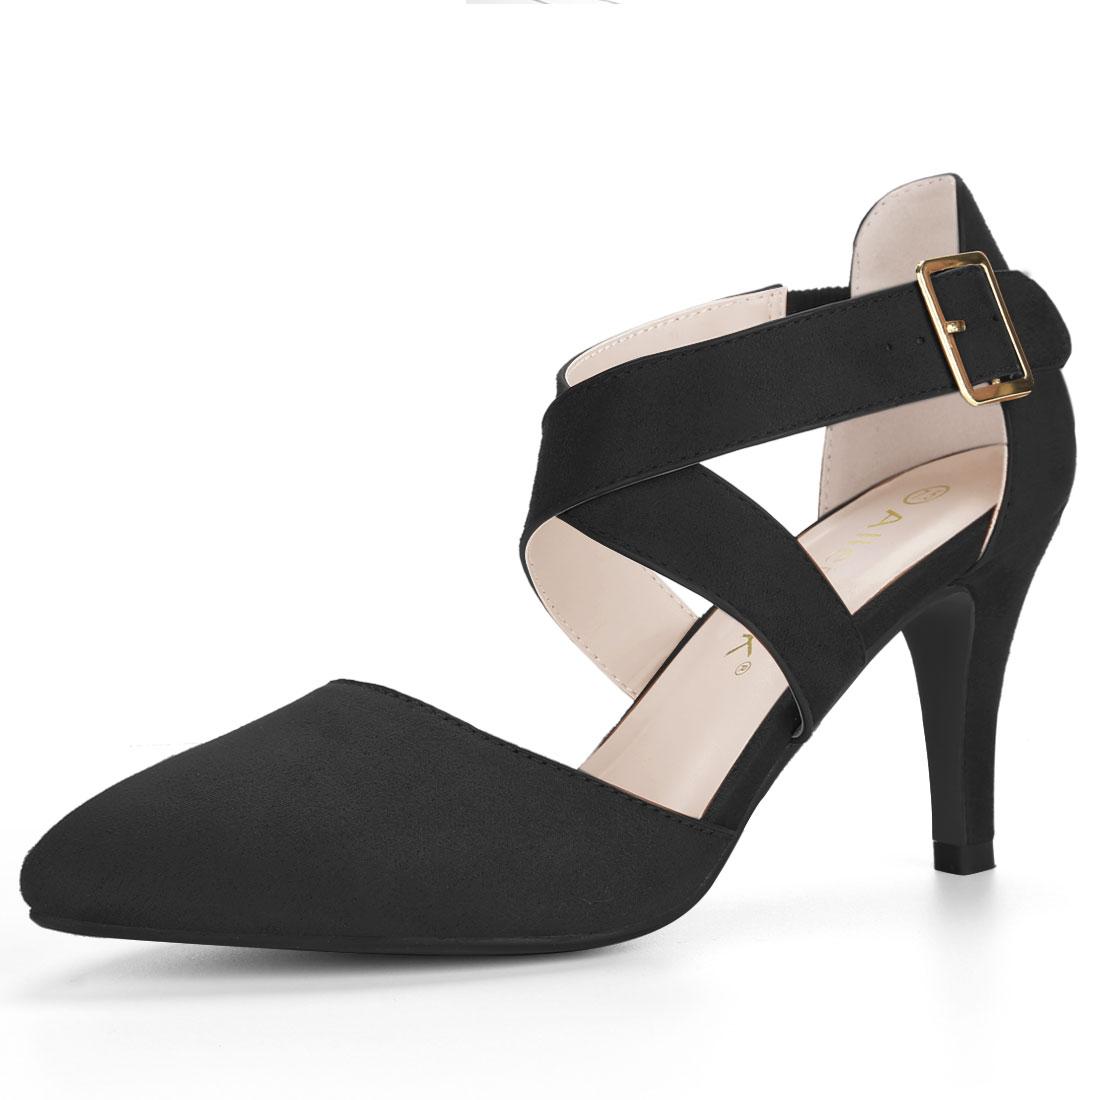 Allegra K Women's Crisscross Straps Stiletto Heel Ankle Strap Pumps Black US 6.5